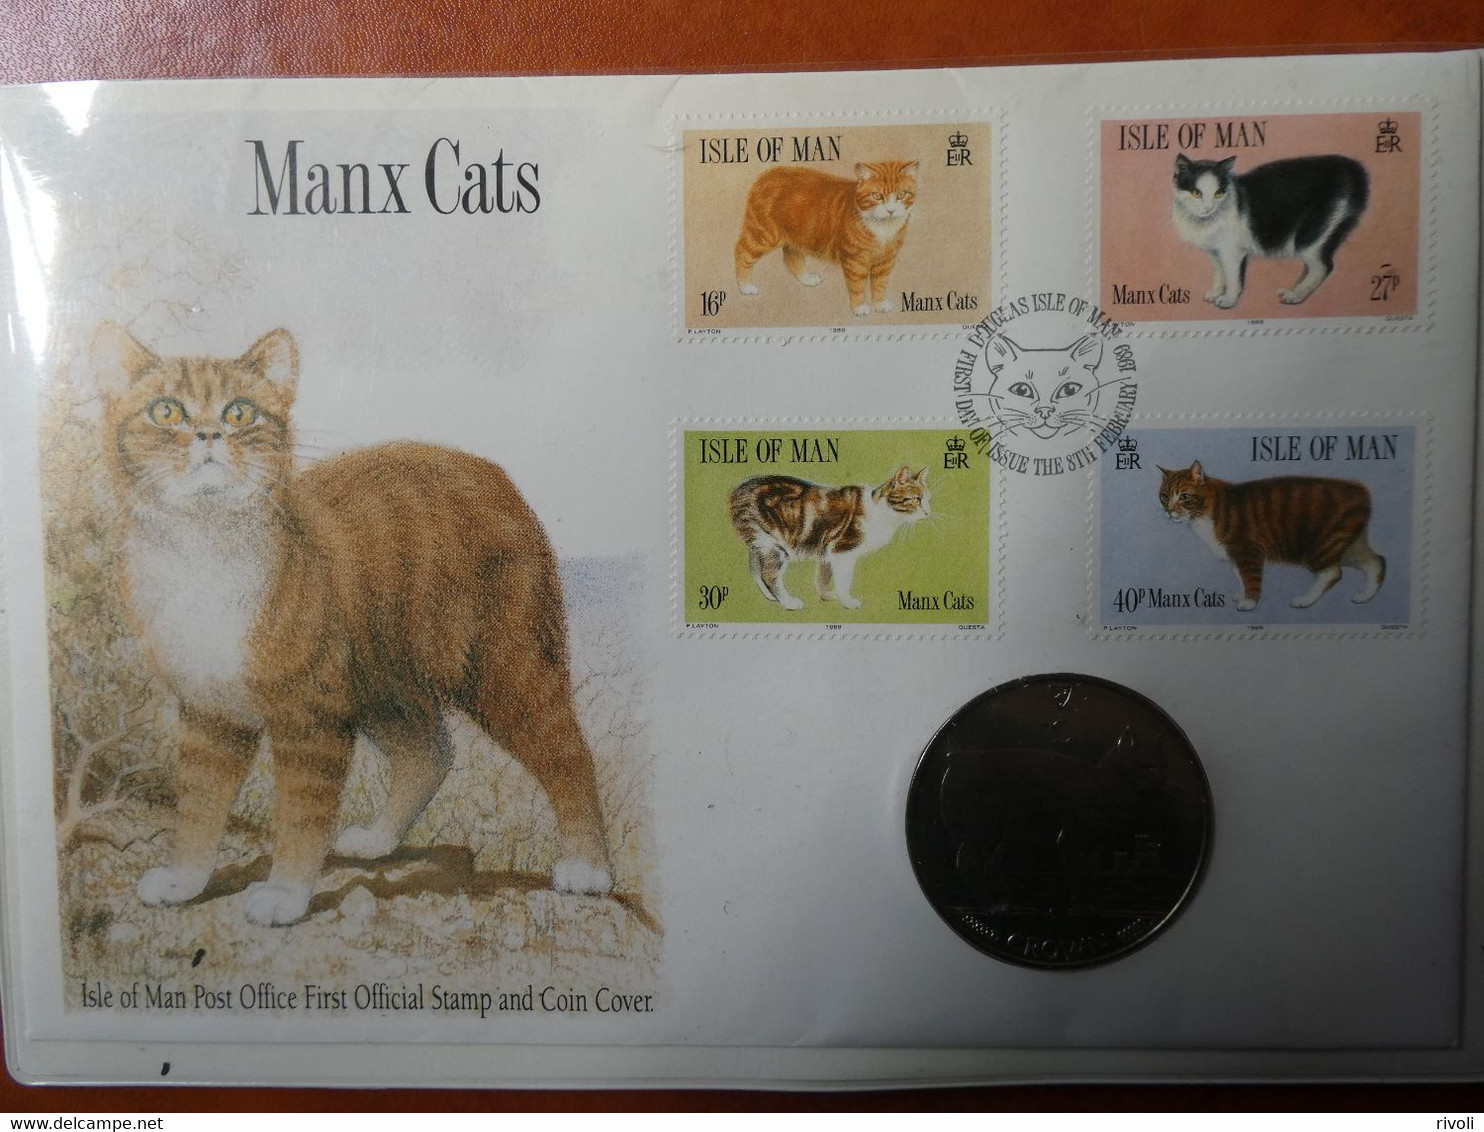 ISLE OF MAN 1989 N° YVERT393/96 , Chats-Manx Cats. Coin Cover-FDC +monnaie - Gatti